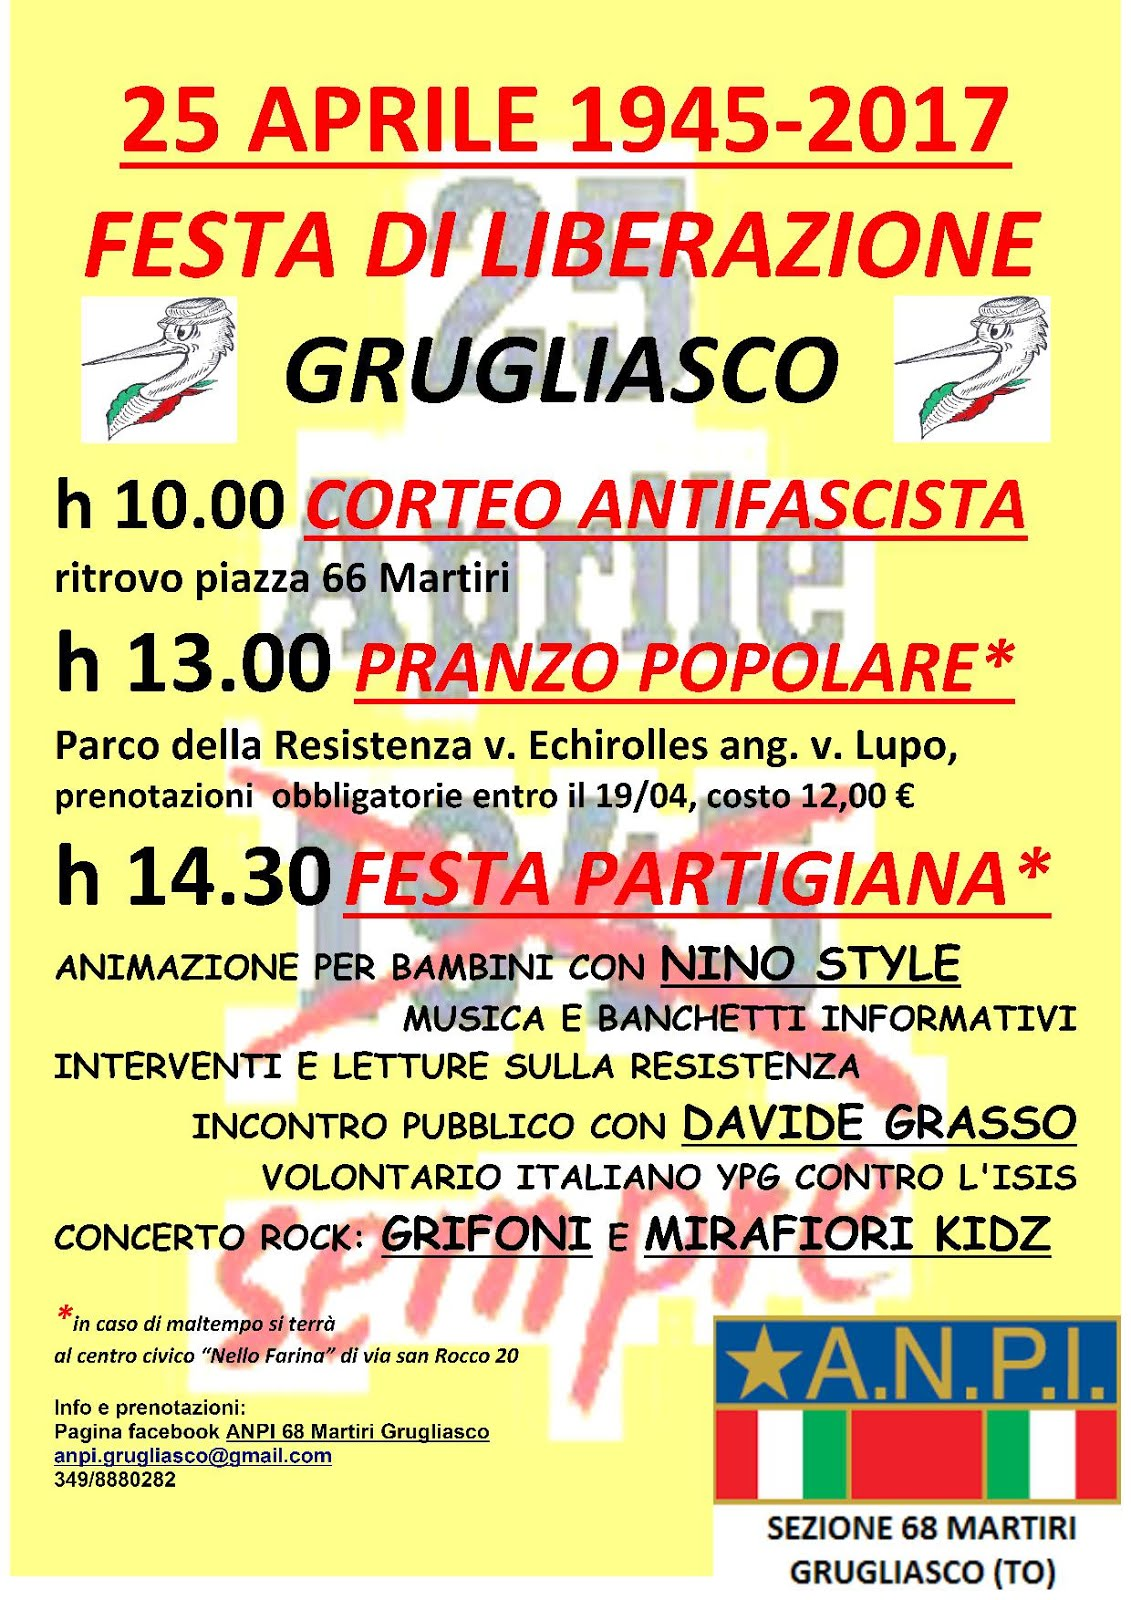 25 Aprile 2017 a Grugliasco